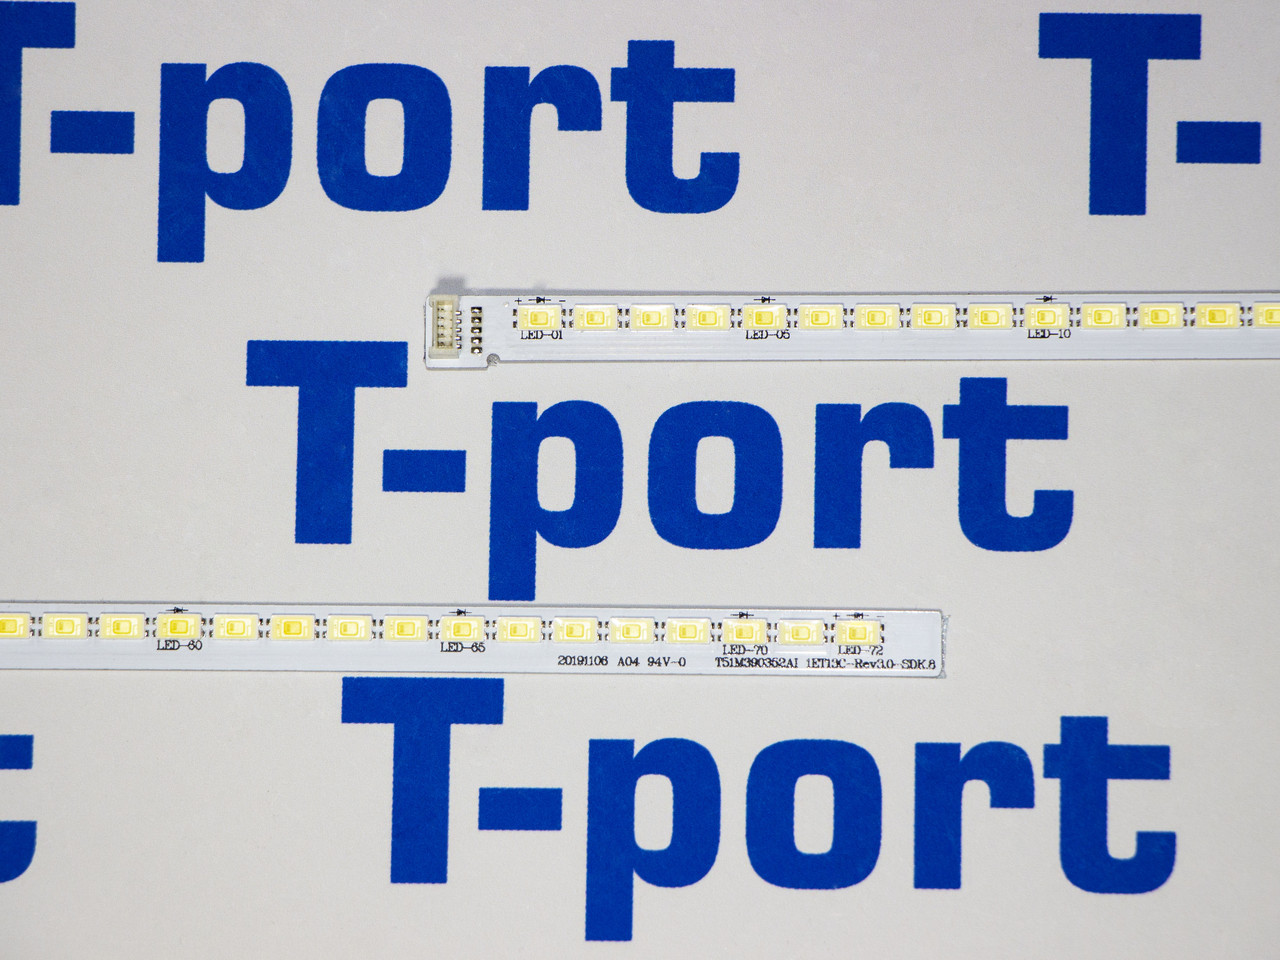 Торцева підсвітка T51M390352AI 1ET13C T52M390354AI1ET13T35 REV1.0 SDK.39